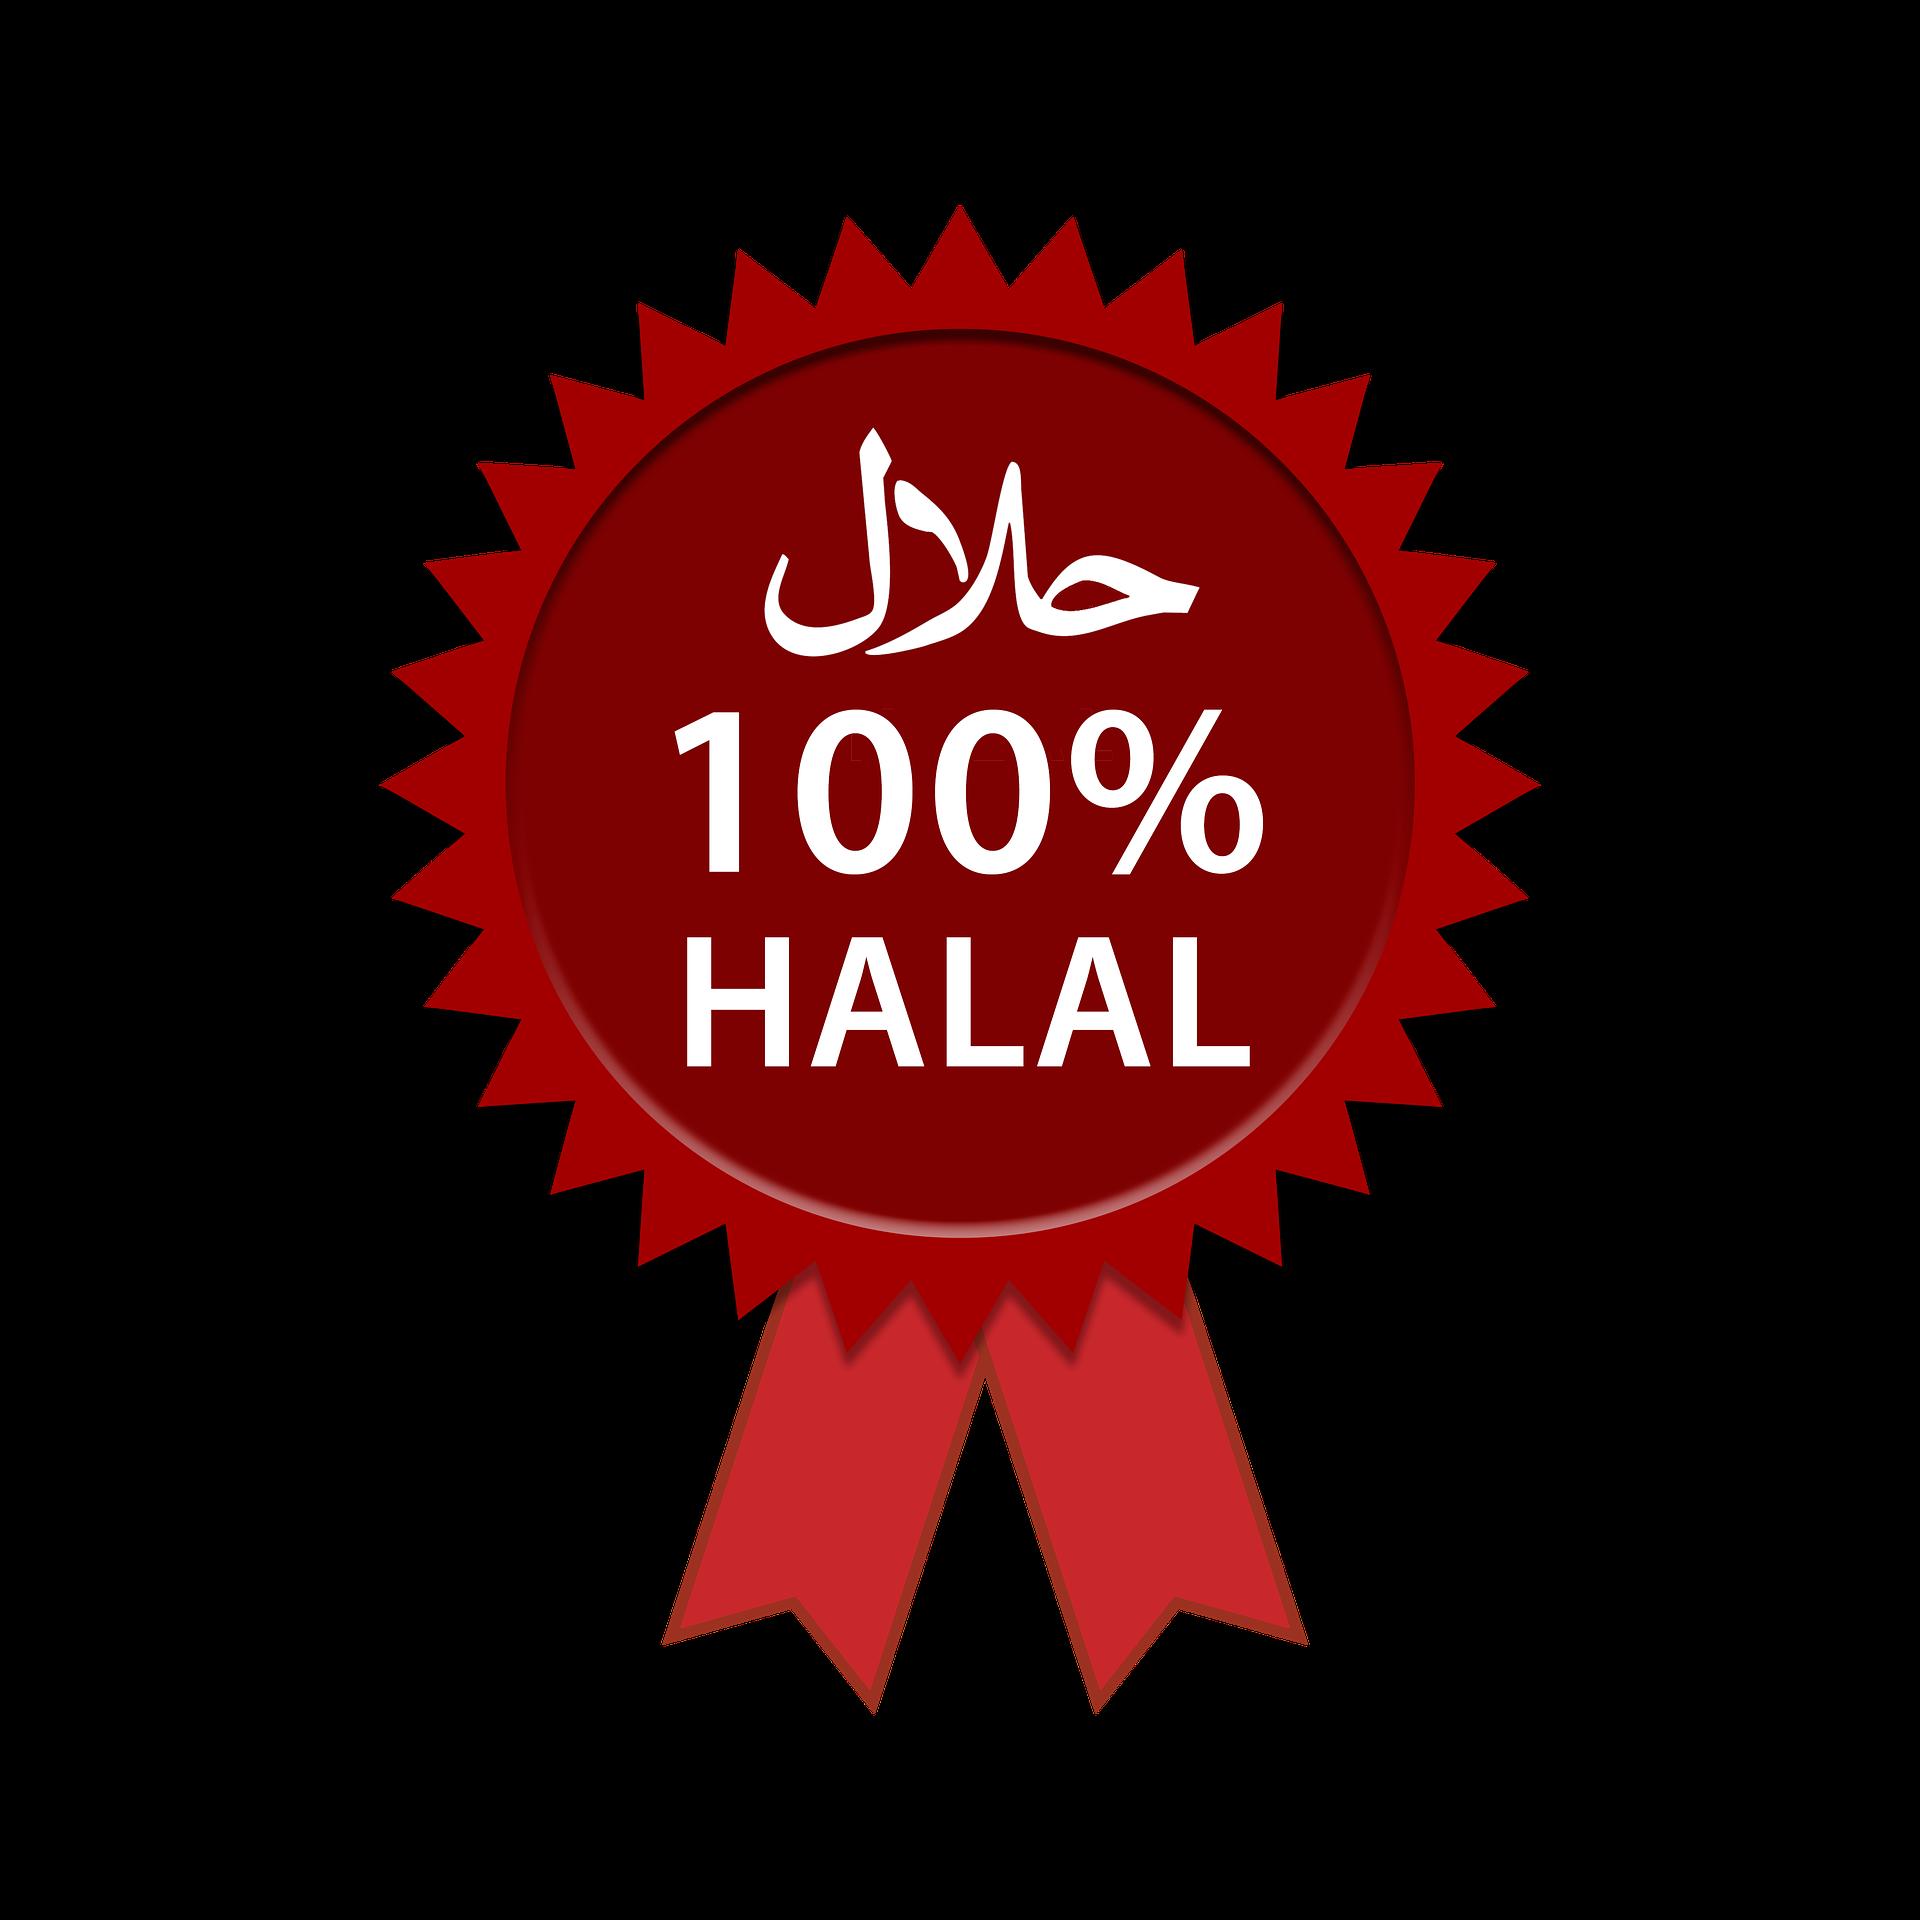 Leve de ongeregelde halal!